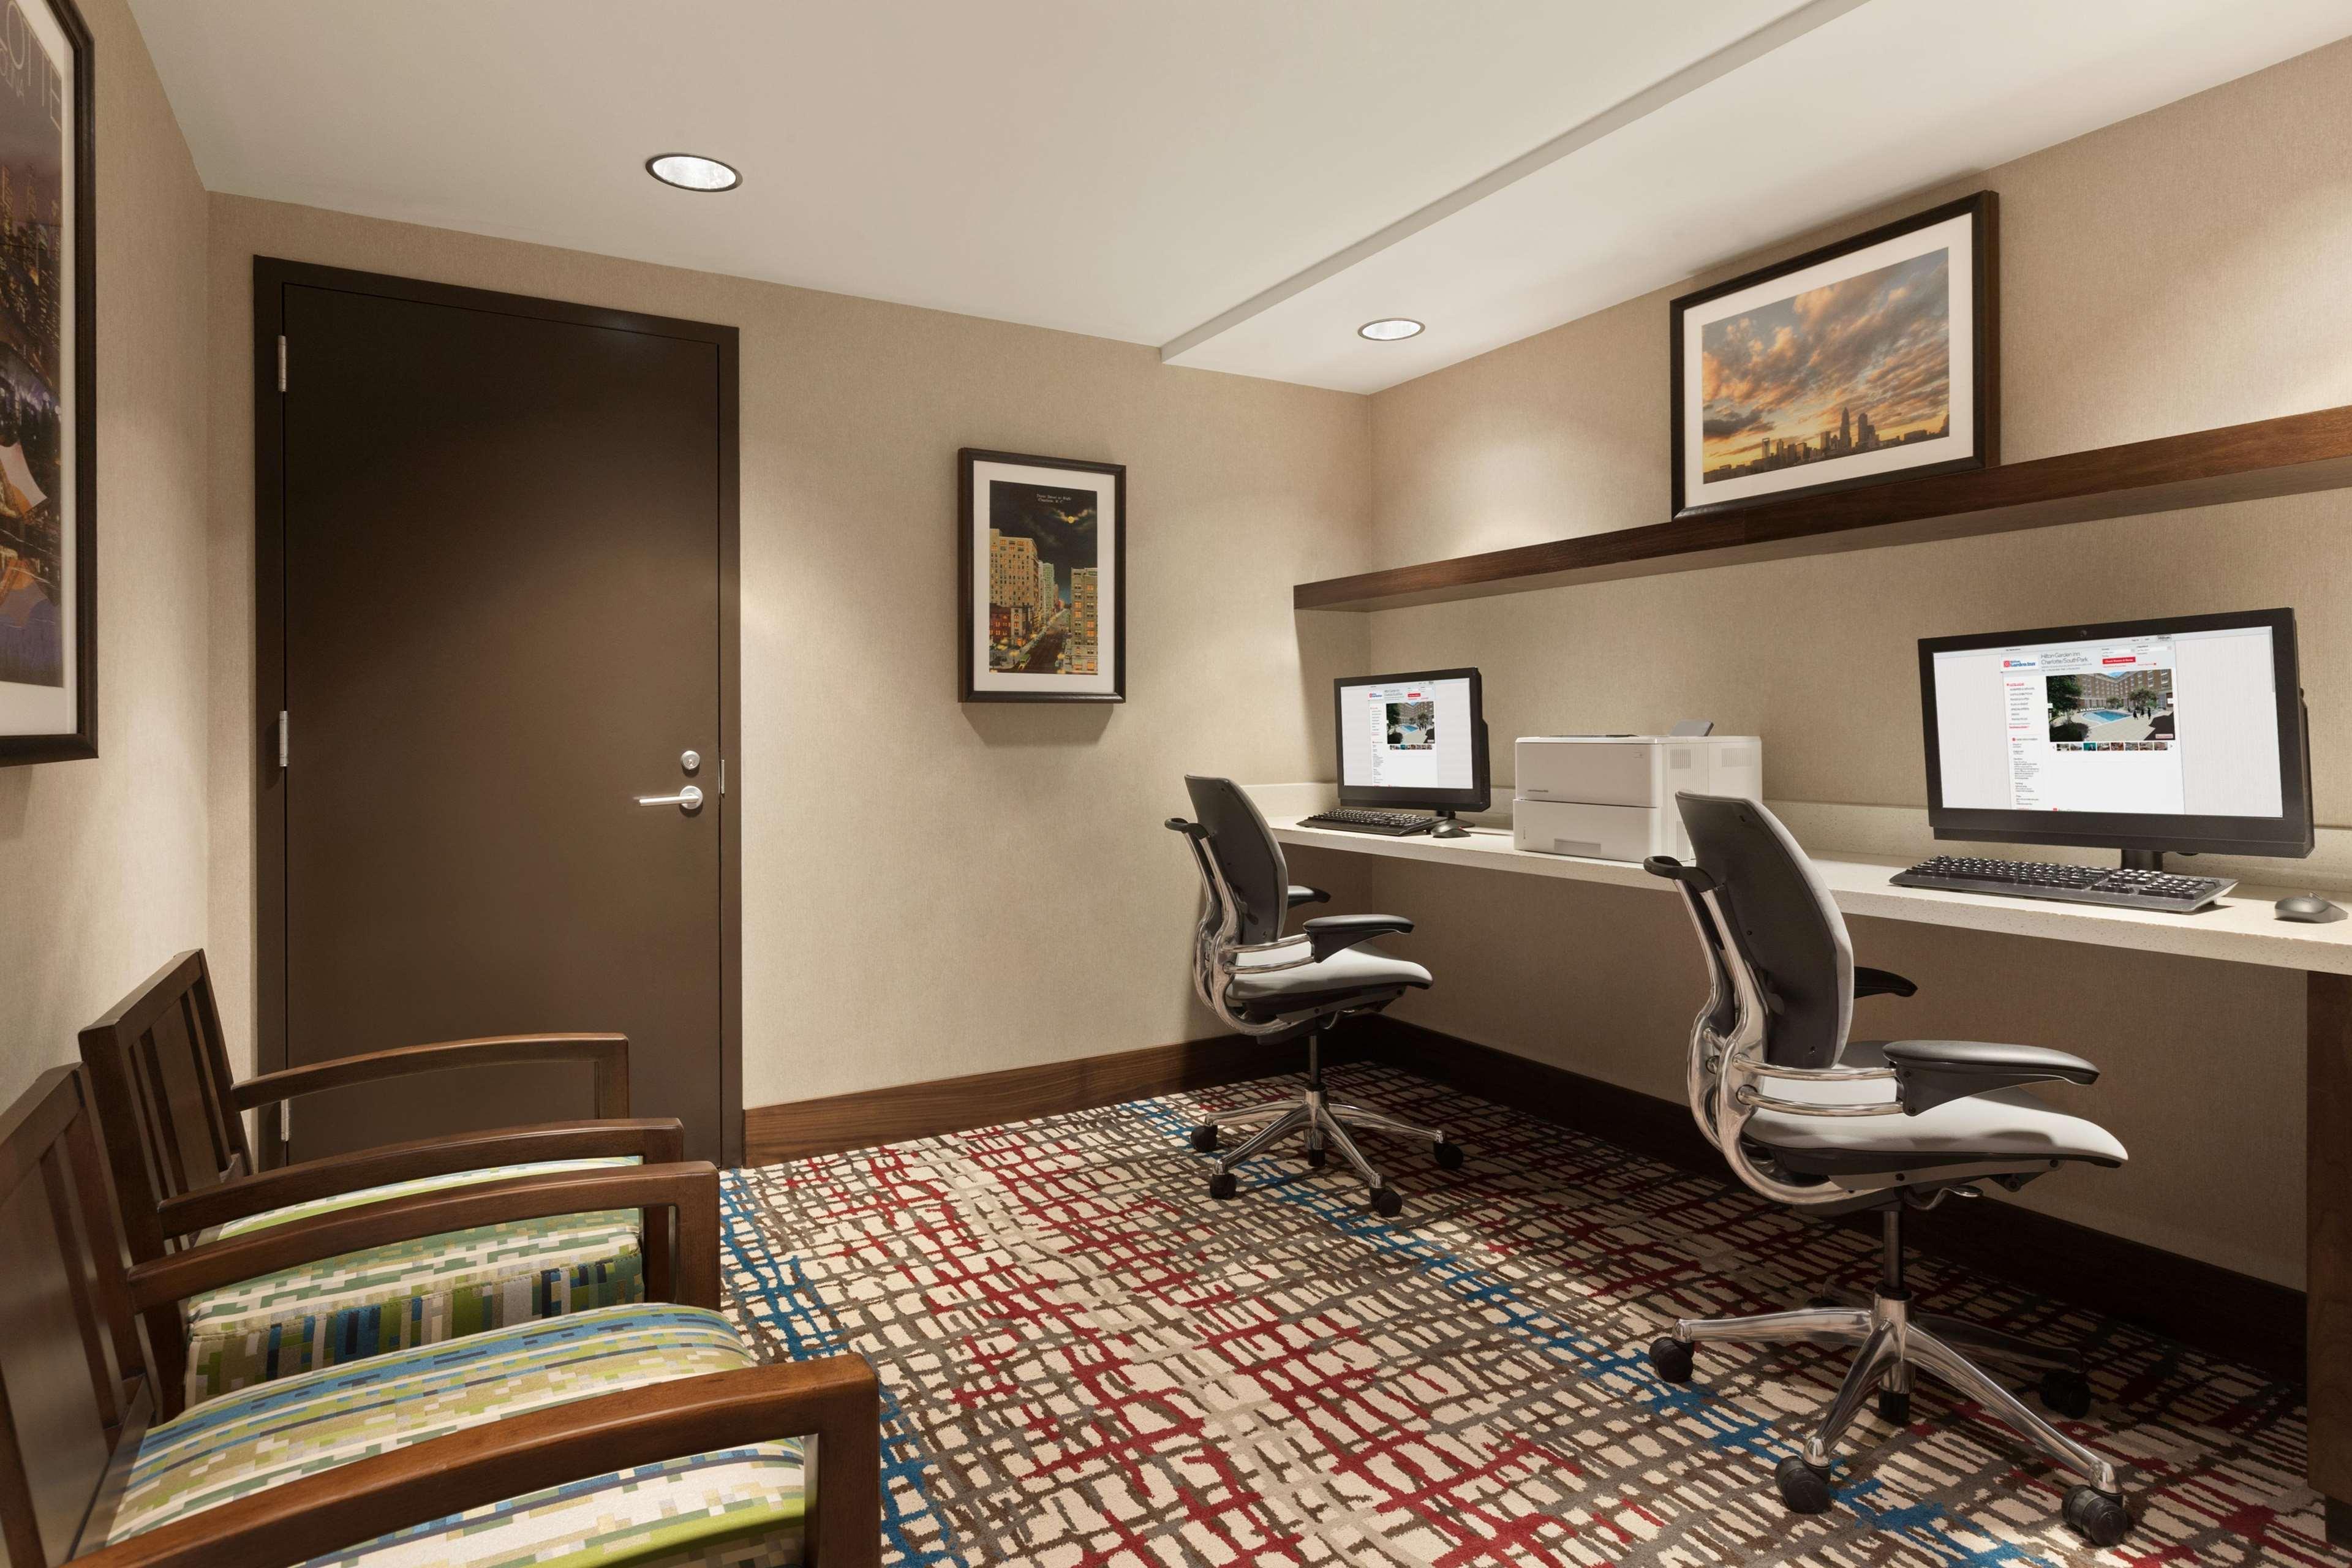 Homewood Suites by Hilton Charlotte/SouthPark image 31